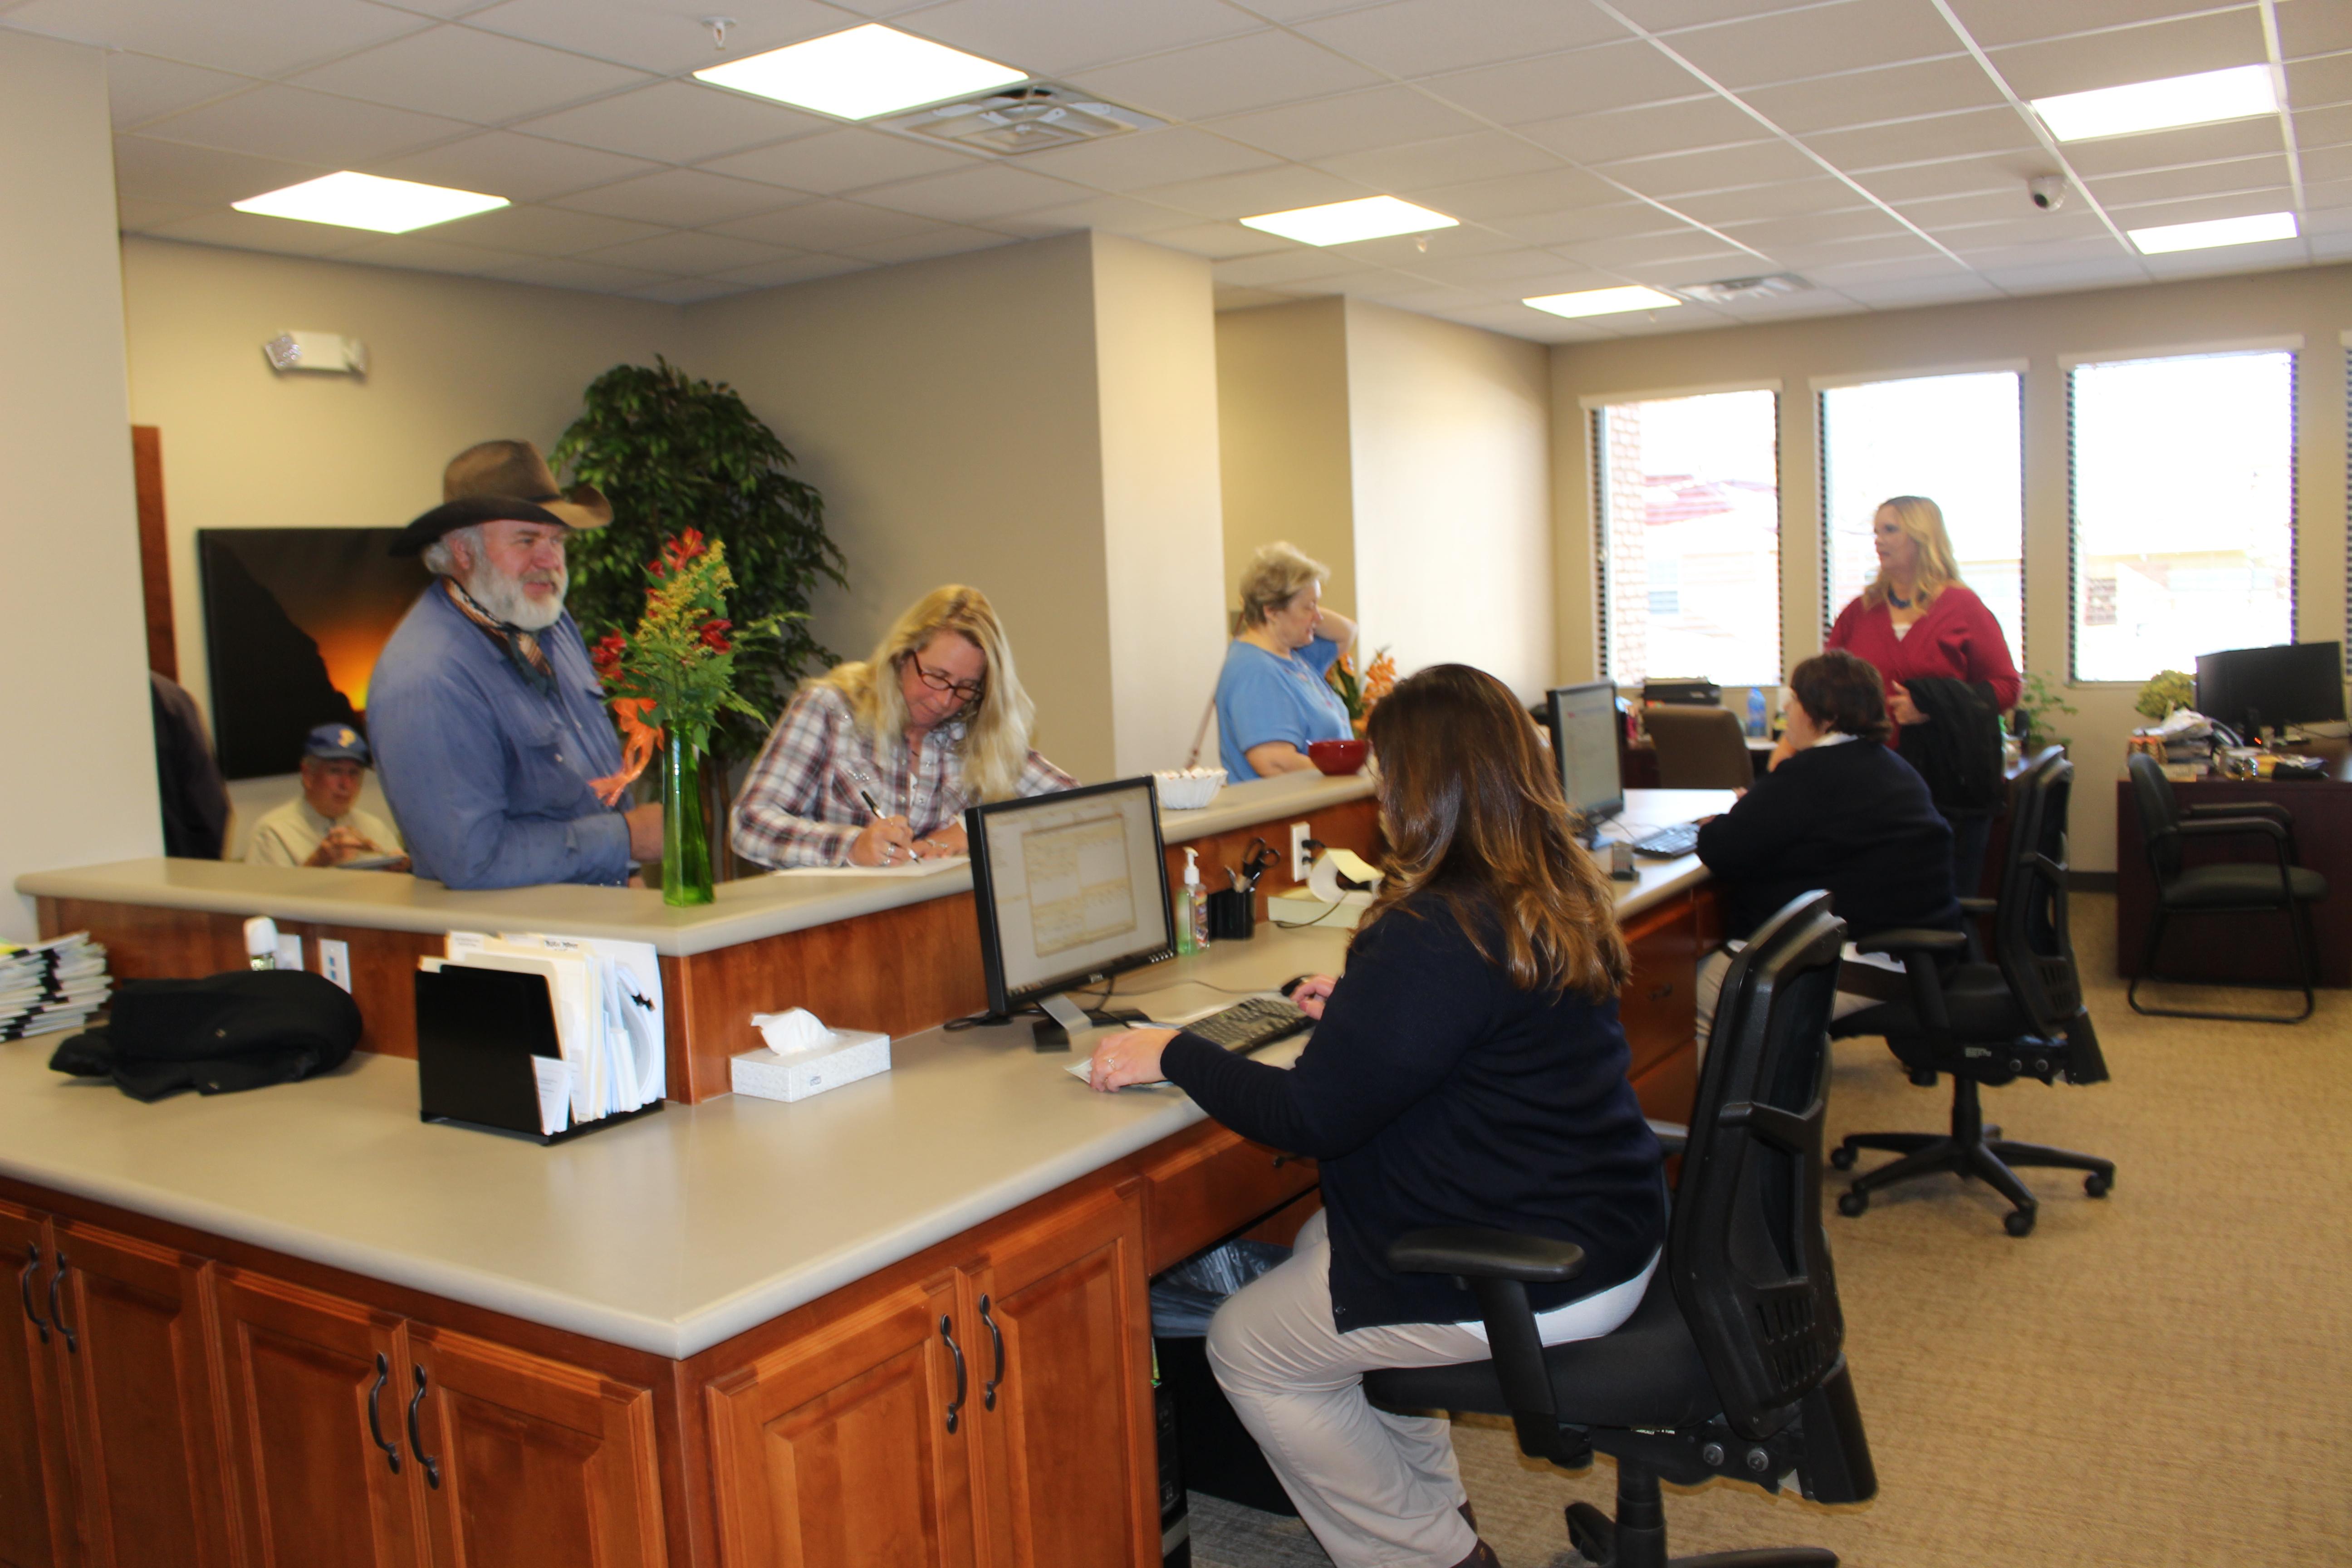 People walk through the new city offices, Parowan, Utah, Nov. 20, 2015 | Photo by Emily Hammer, St. George News